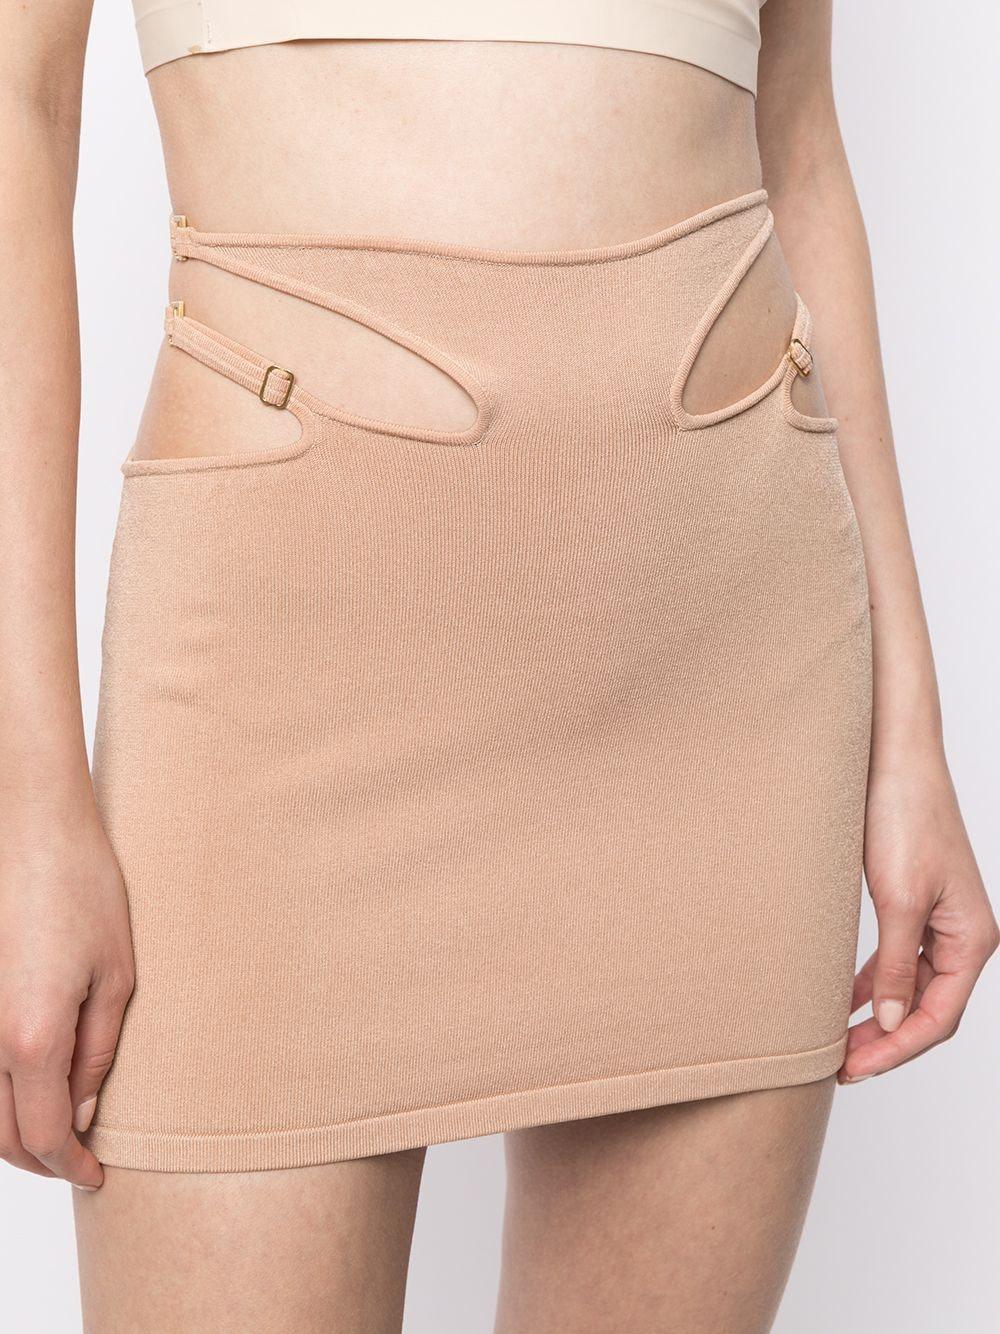 Cut-Out Hosiery Mini Skirt